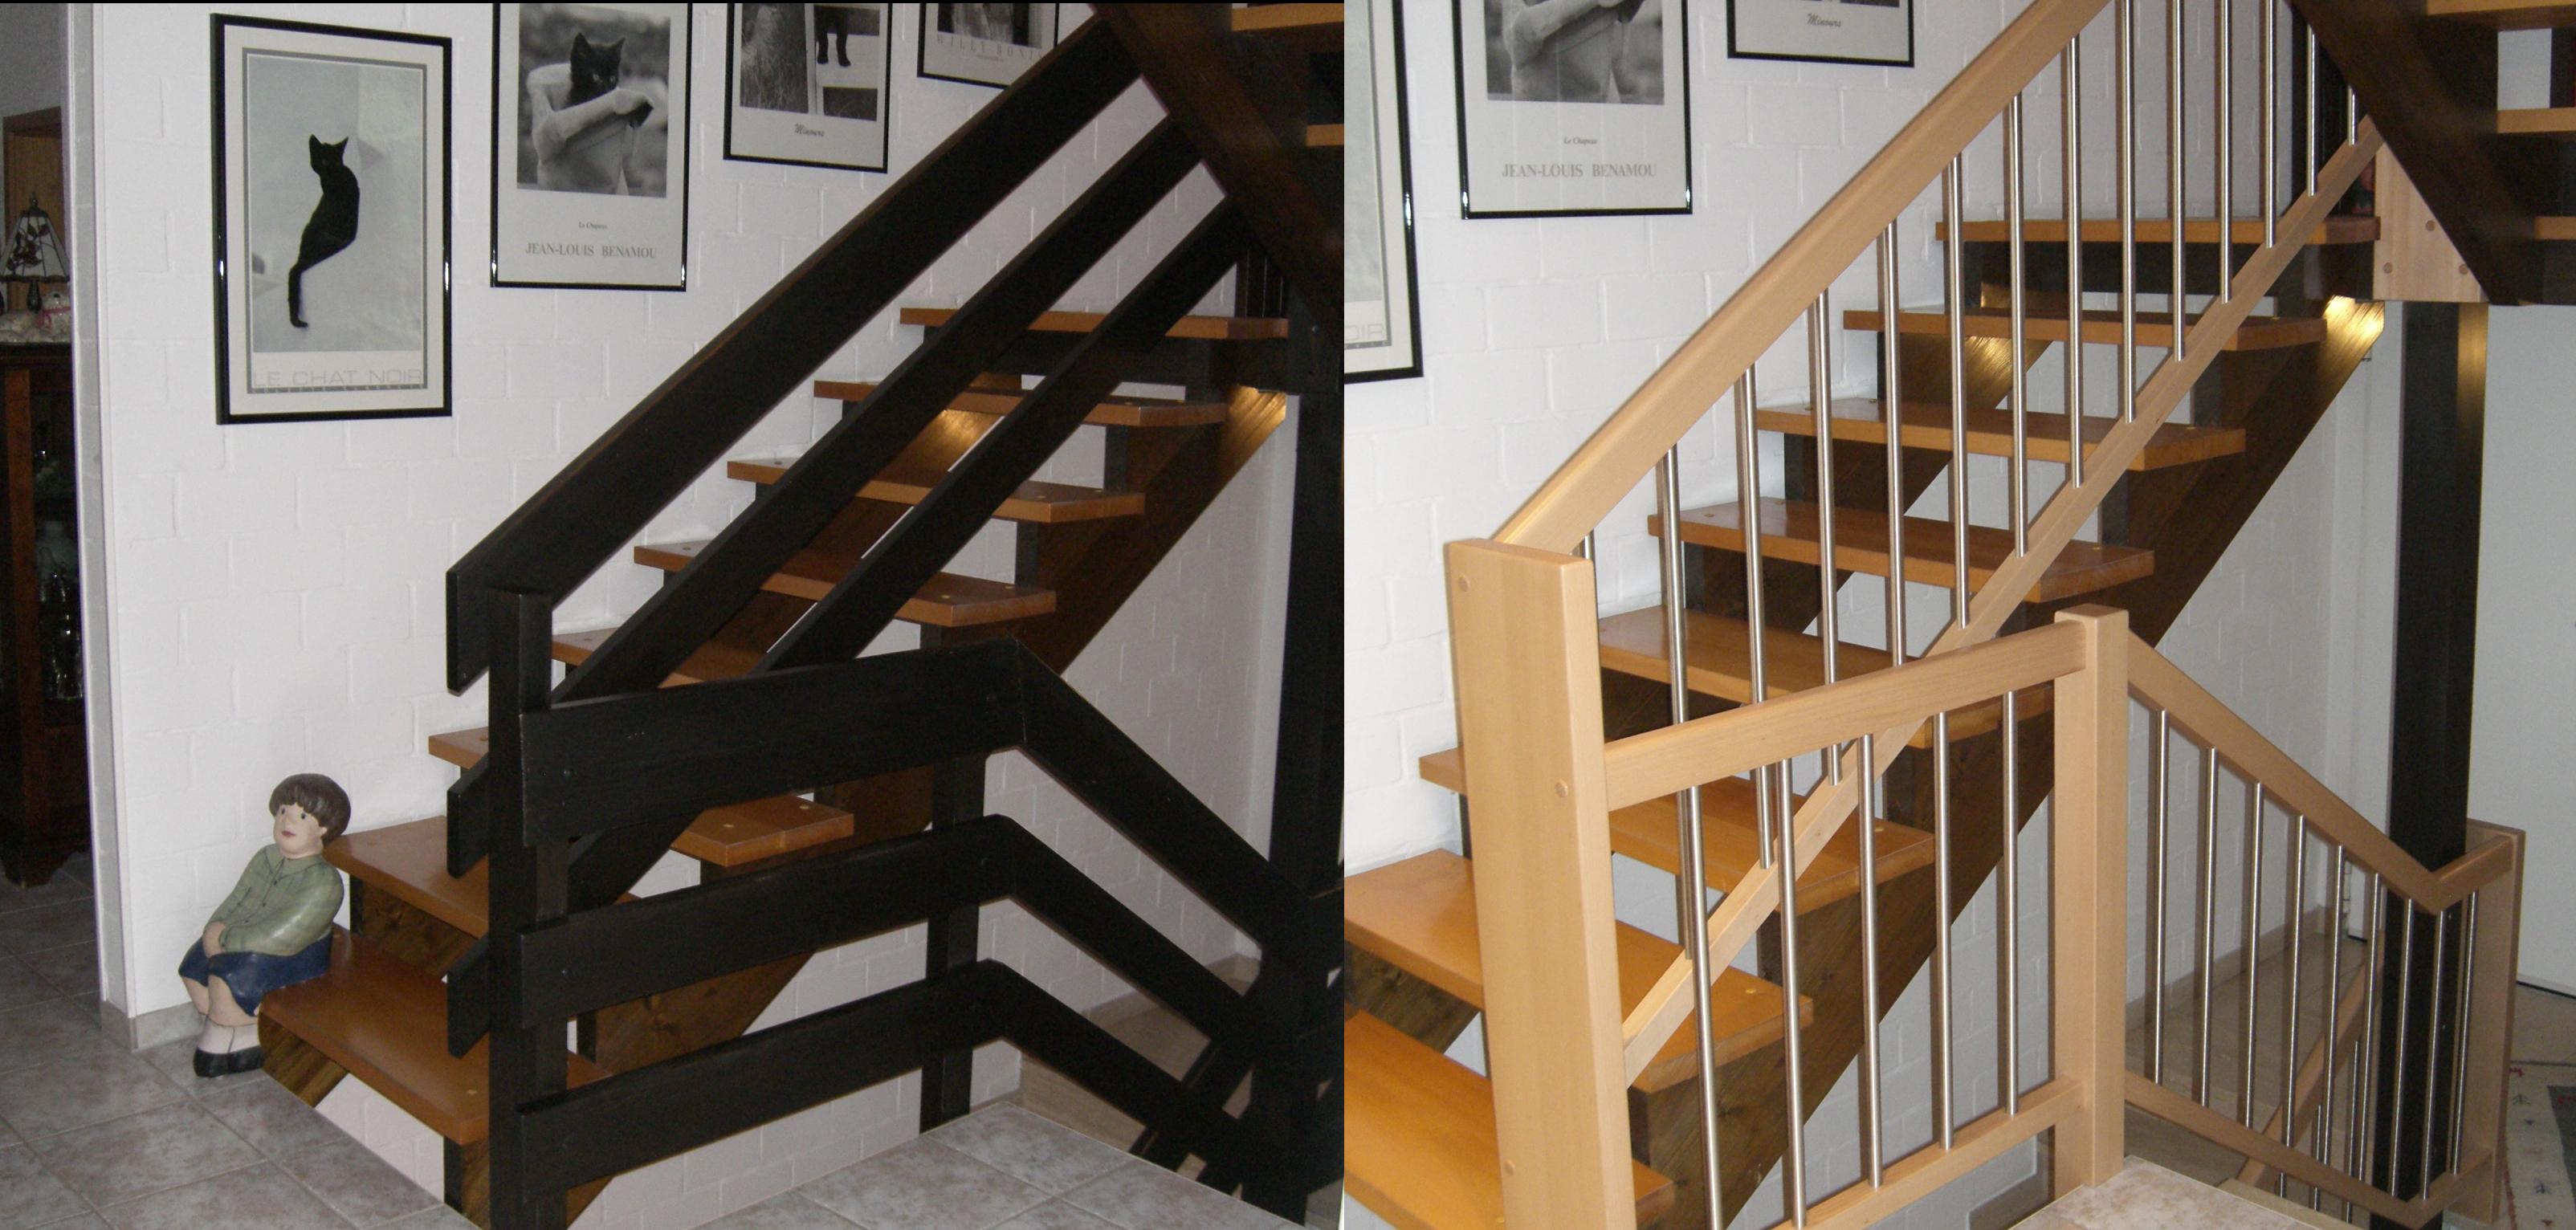 Holzgeländer erneuert in Buche hell, Massivholz